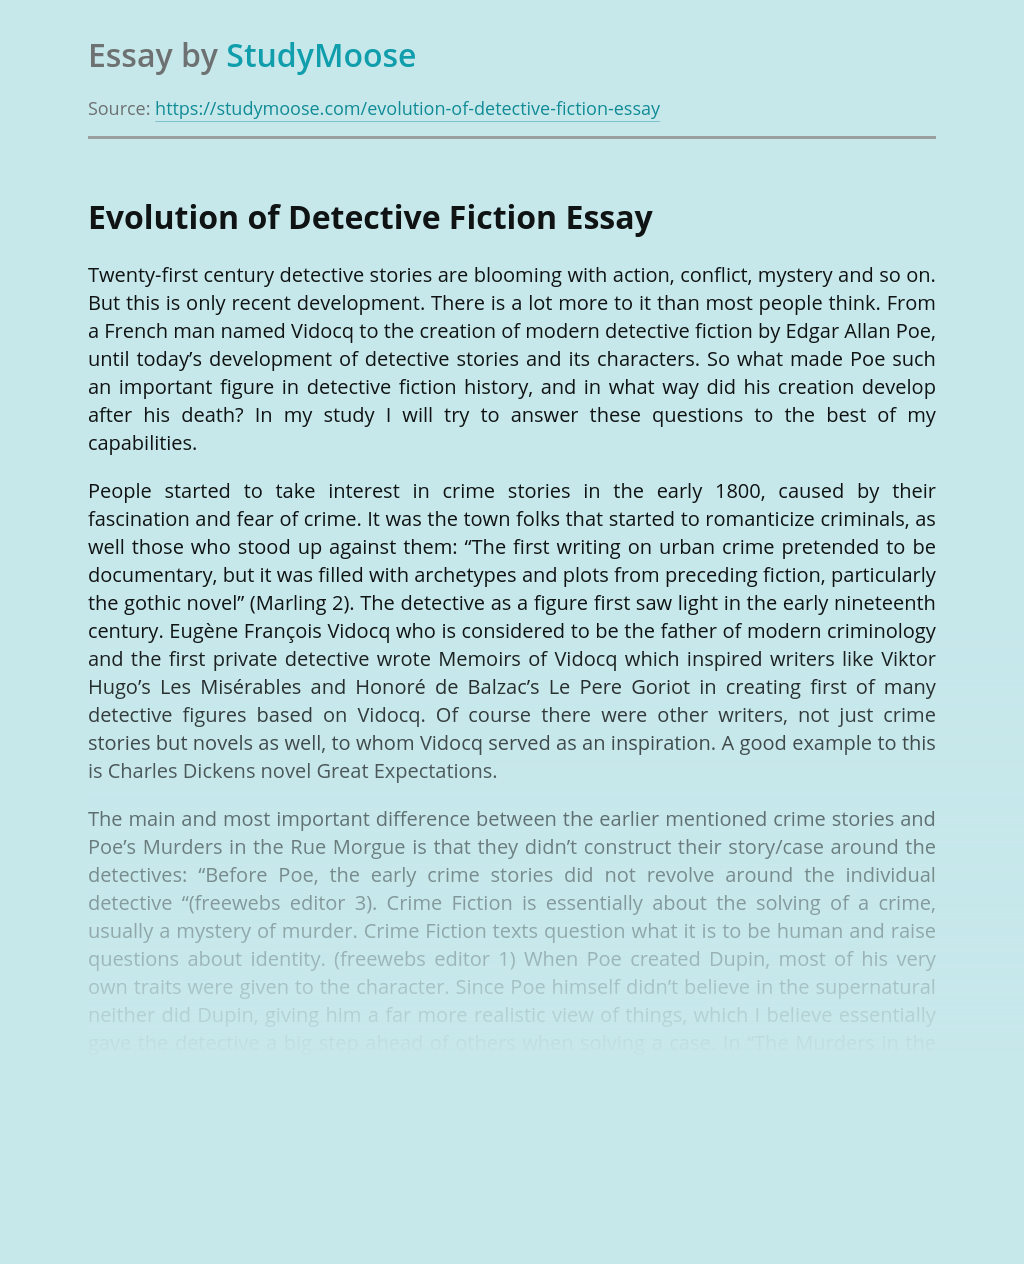 Evolution of Detective Fiction